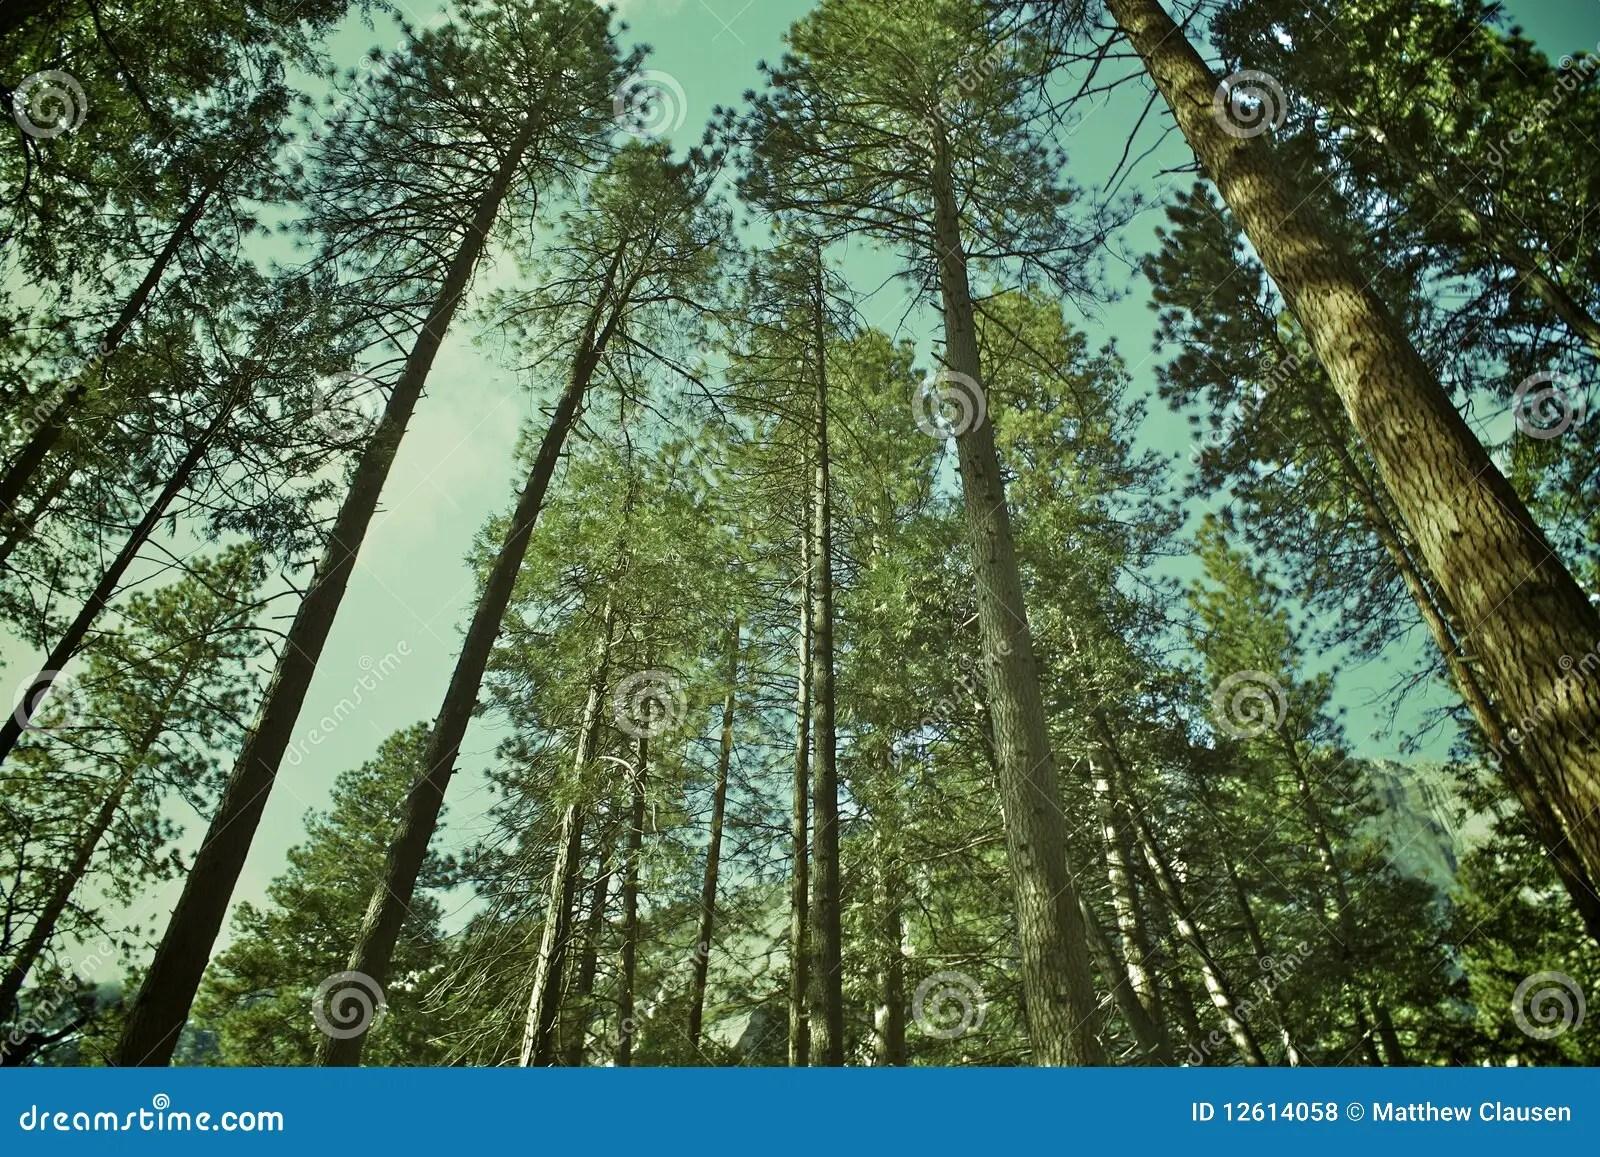 Tall Green Trees Royalty Free Stock Photos Image 12614058